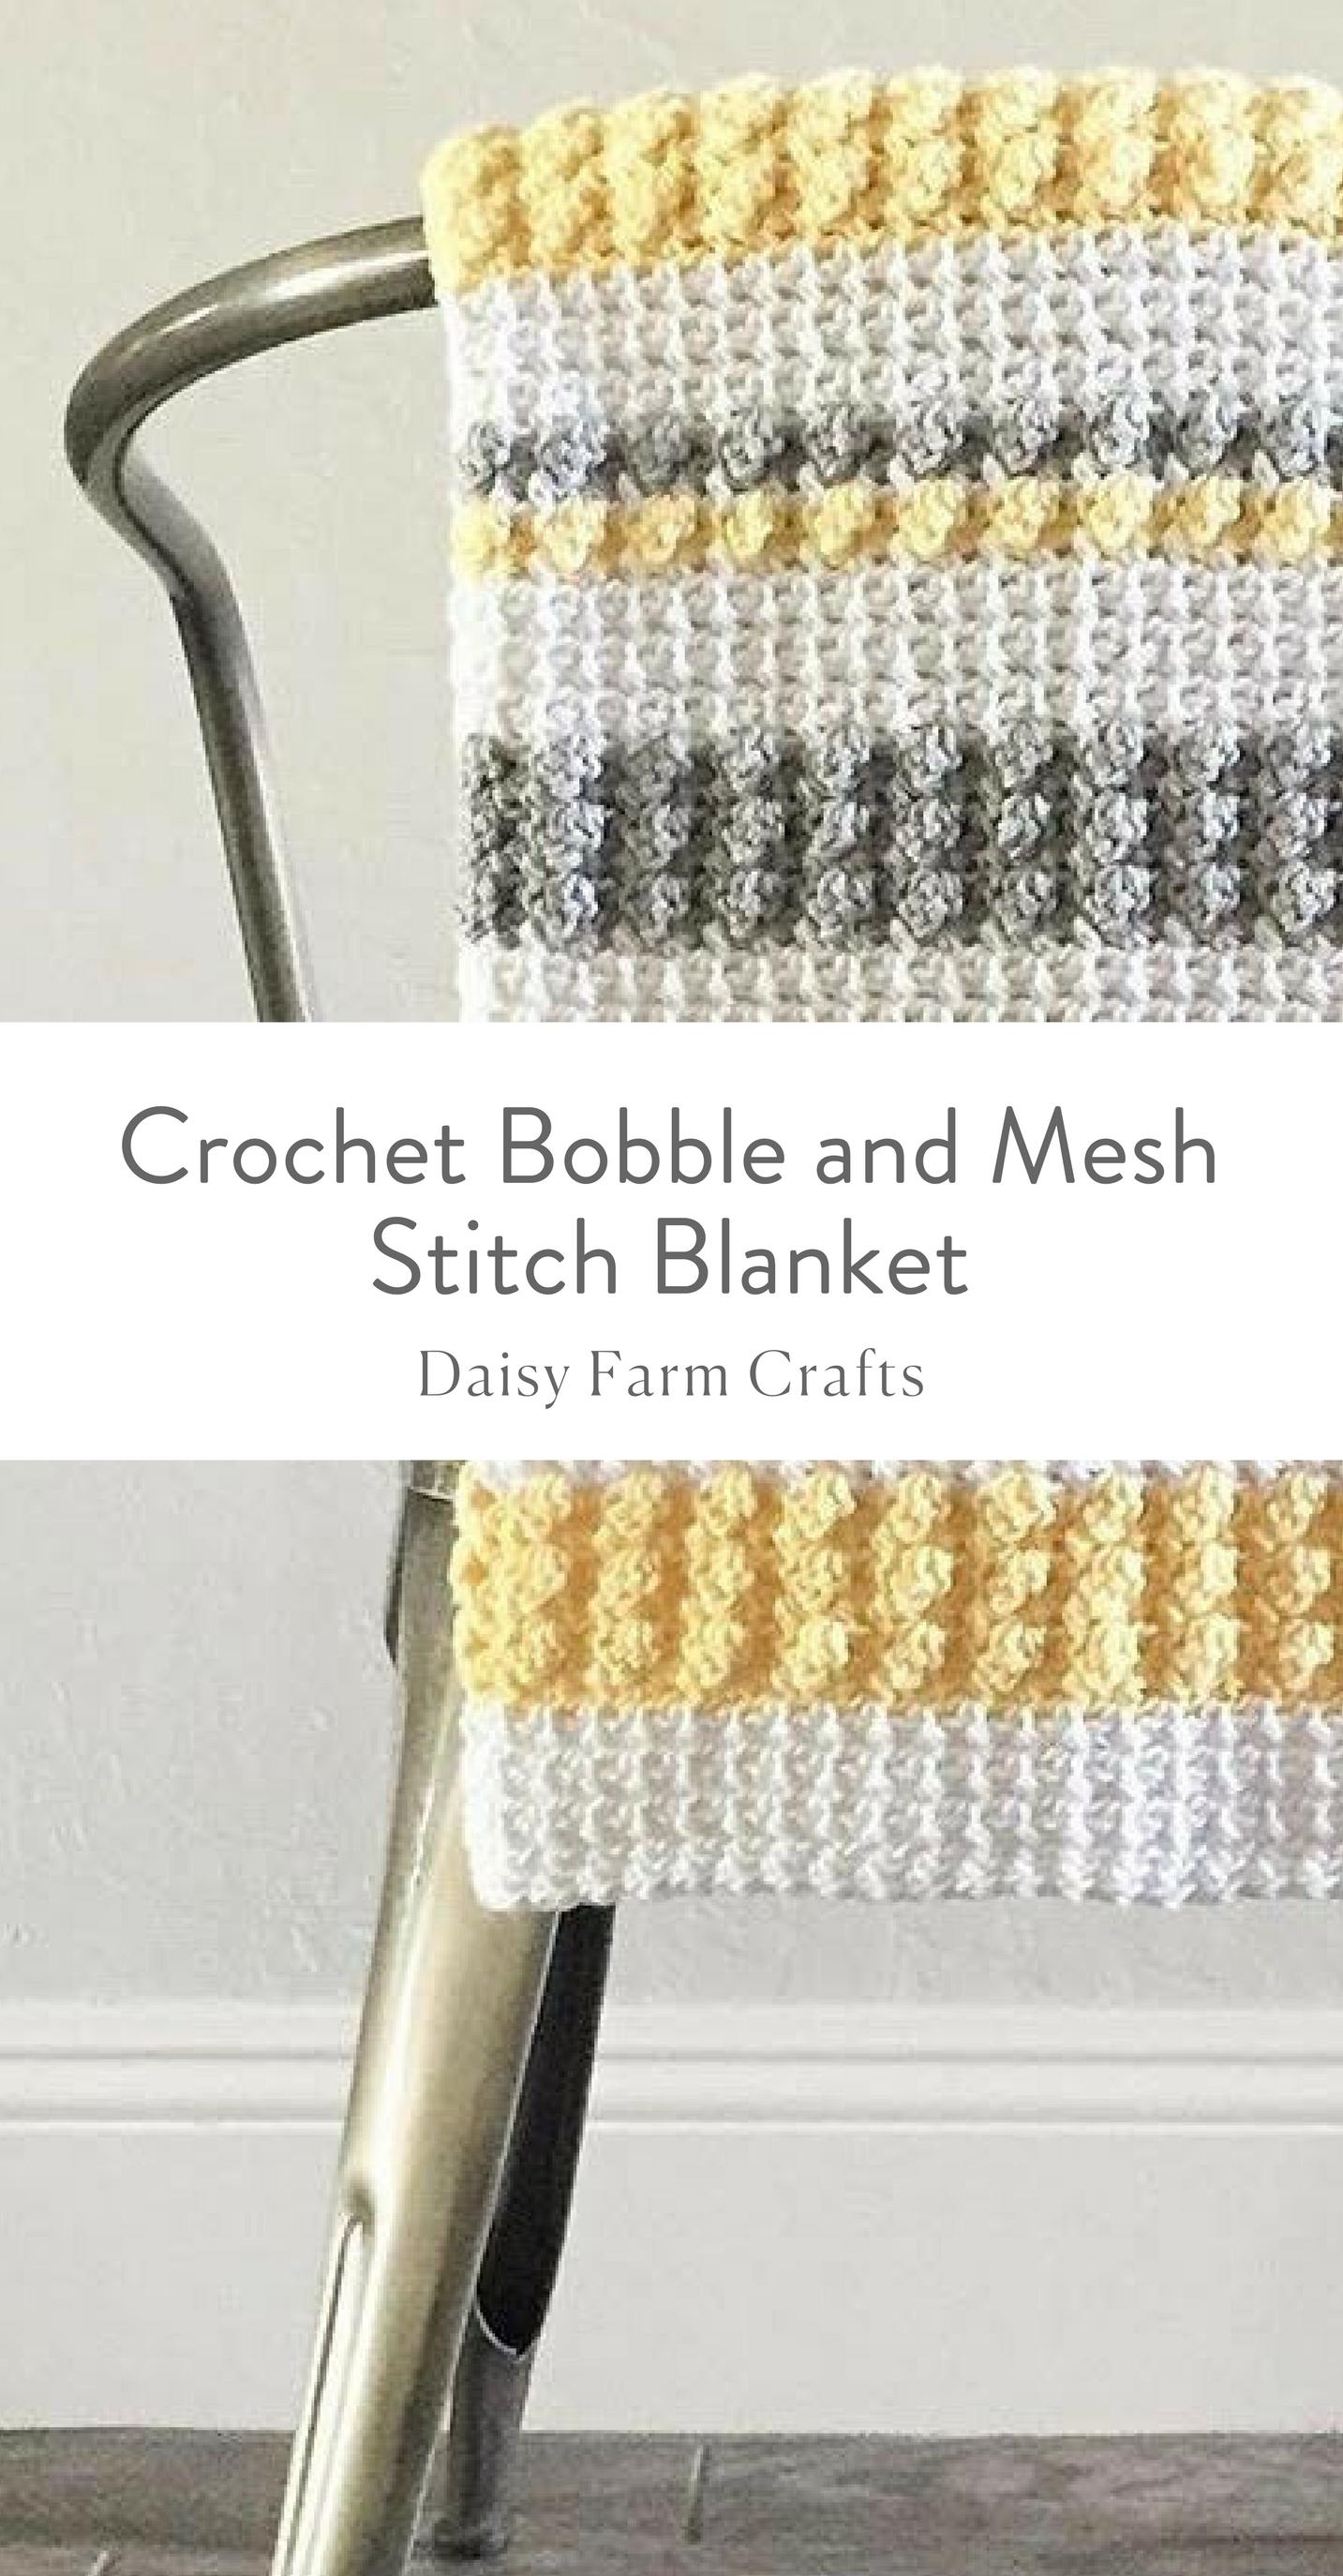 Free Pattern - Crochet Bobble and Mesh Stitch Blanket   cROCHET ...